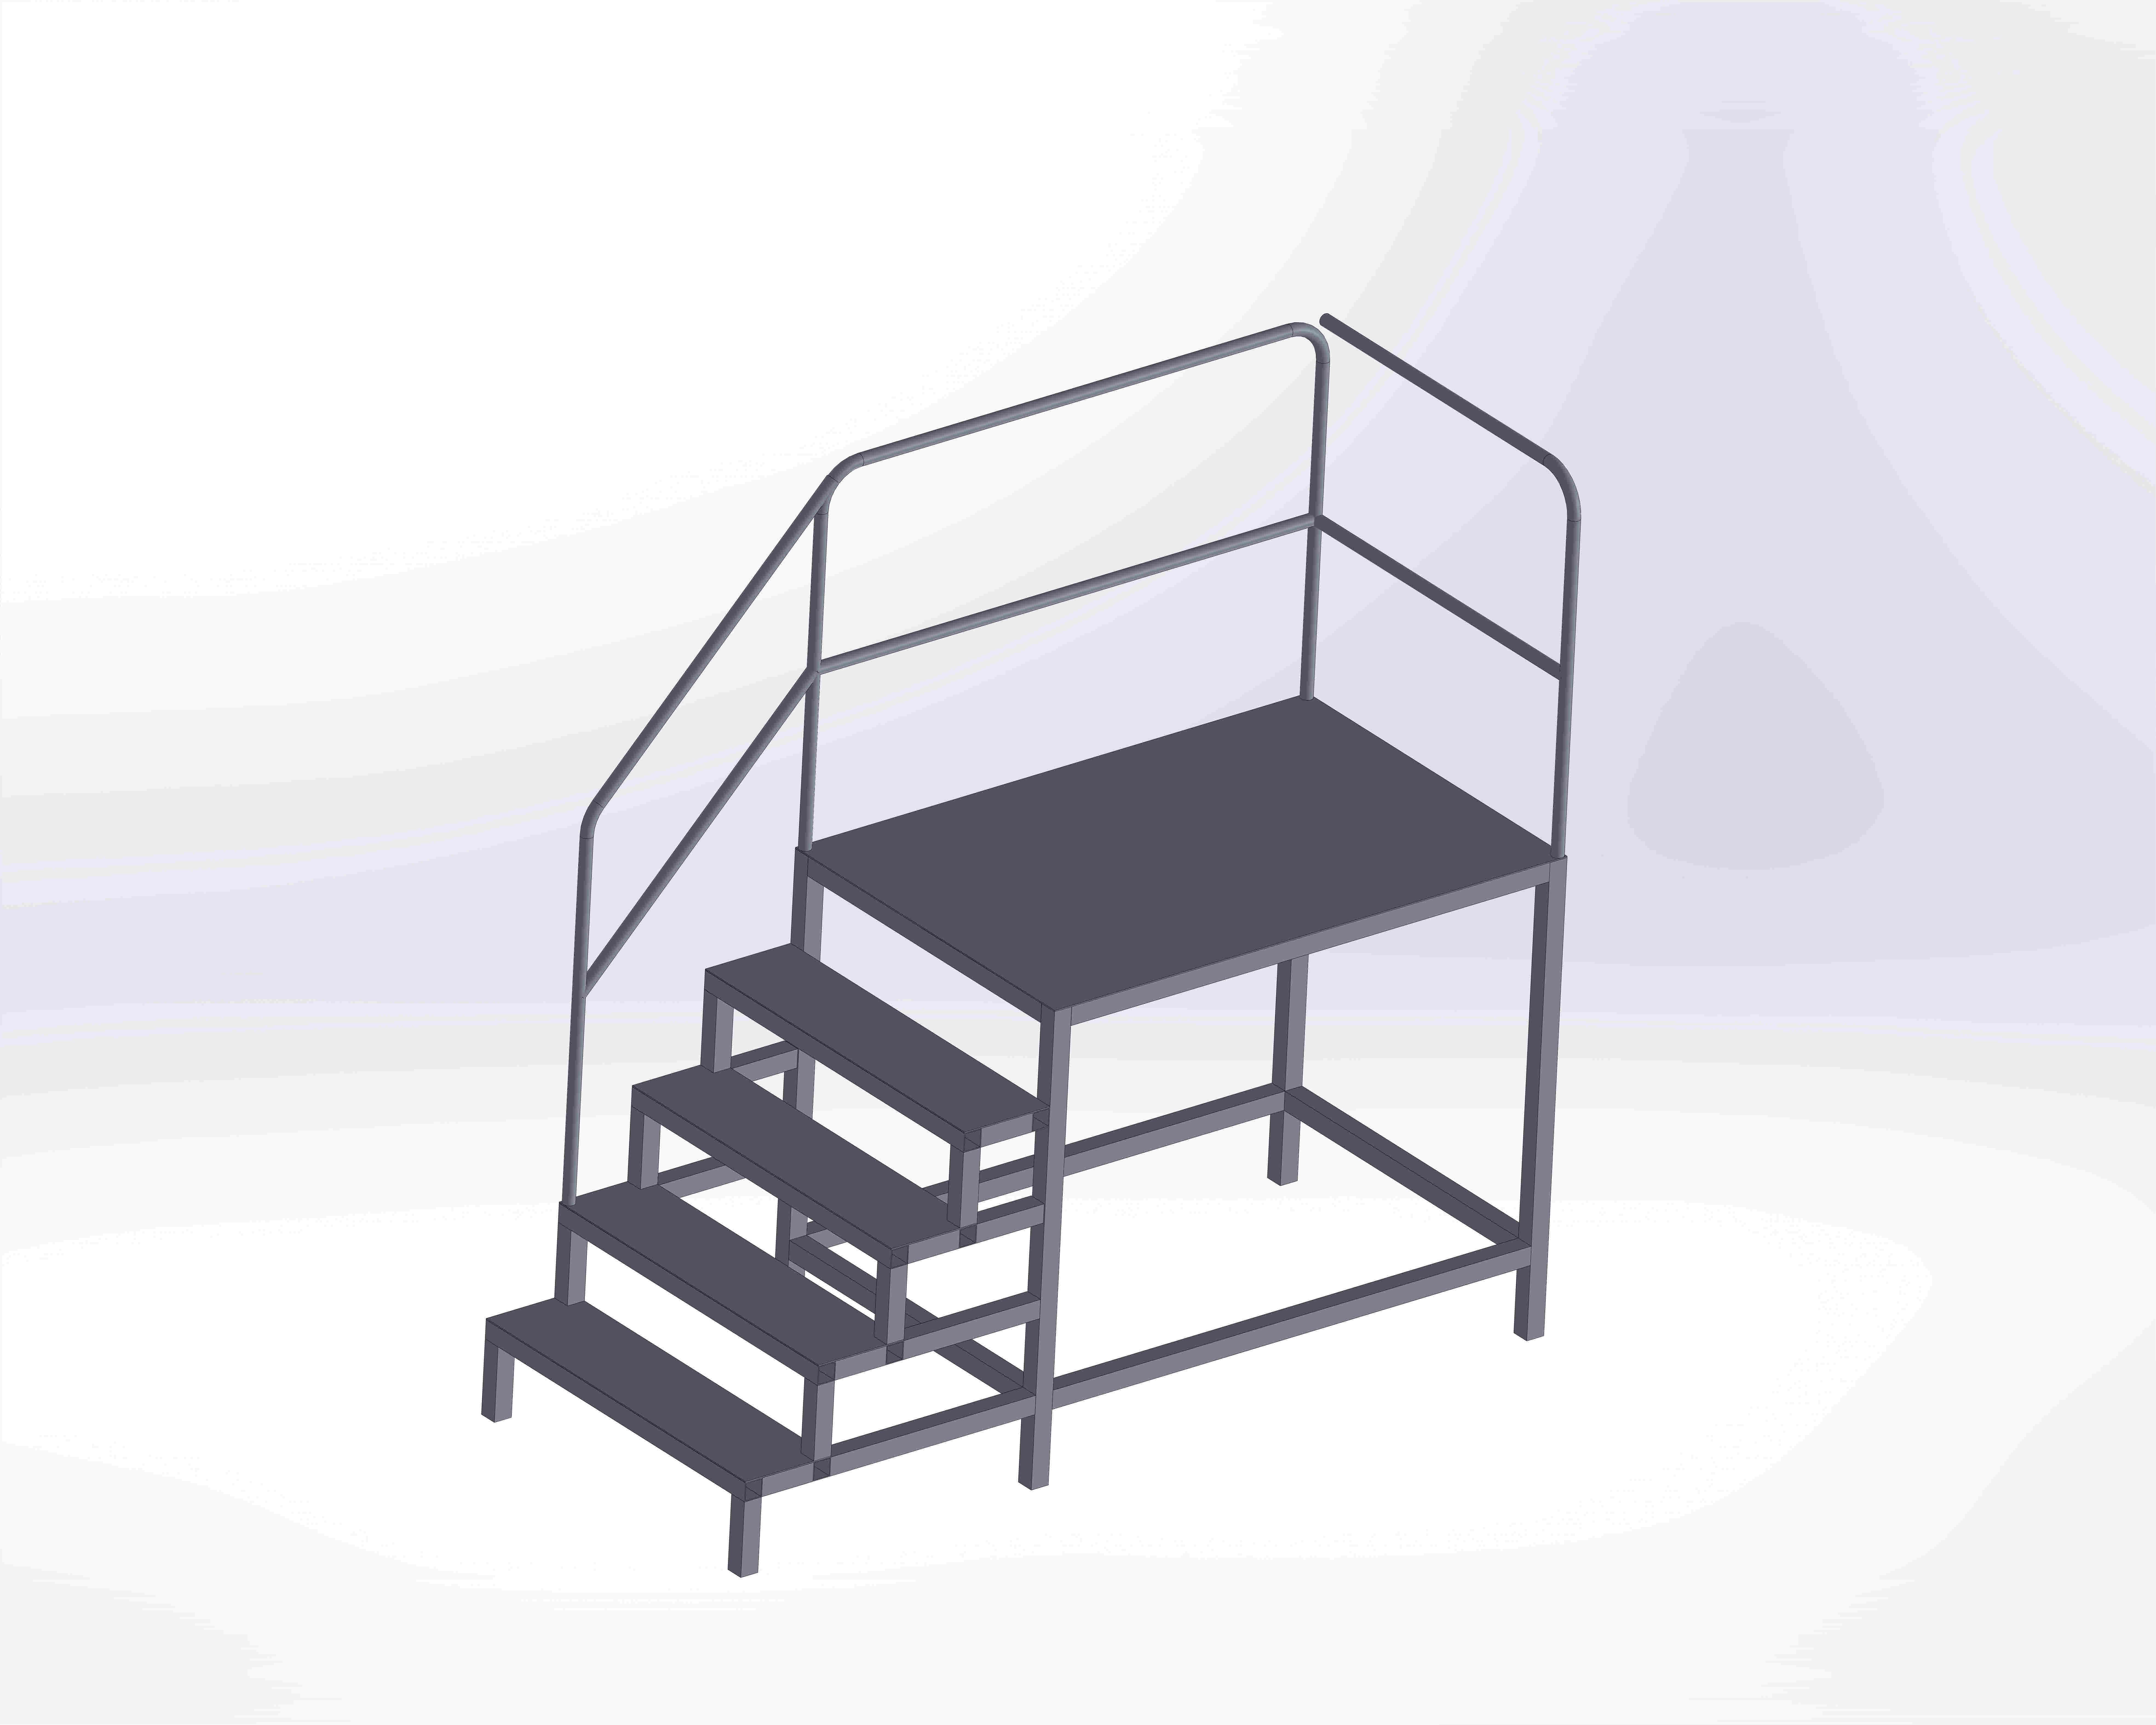 Veteriner Kontrol Platformu - Sabit